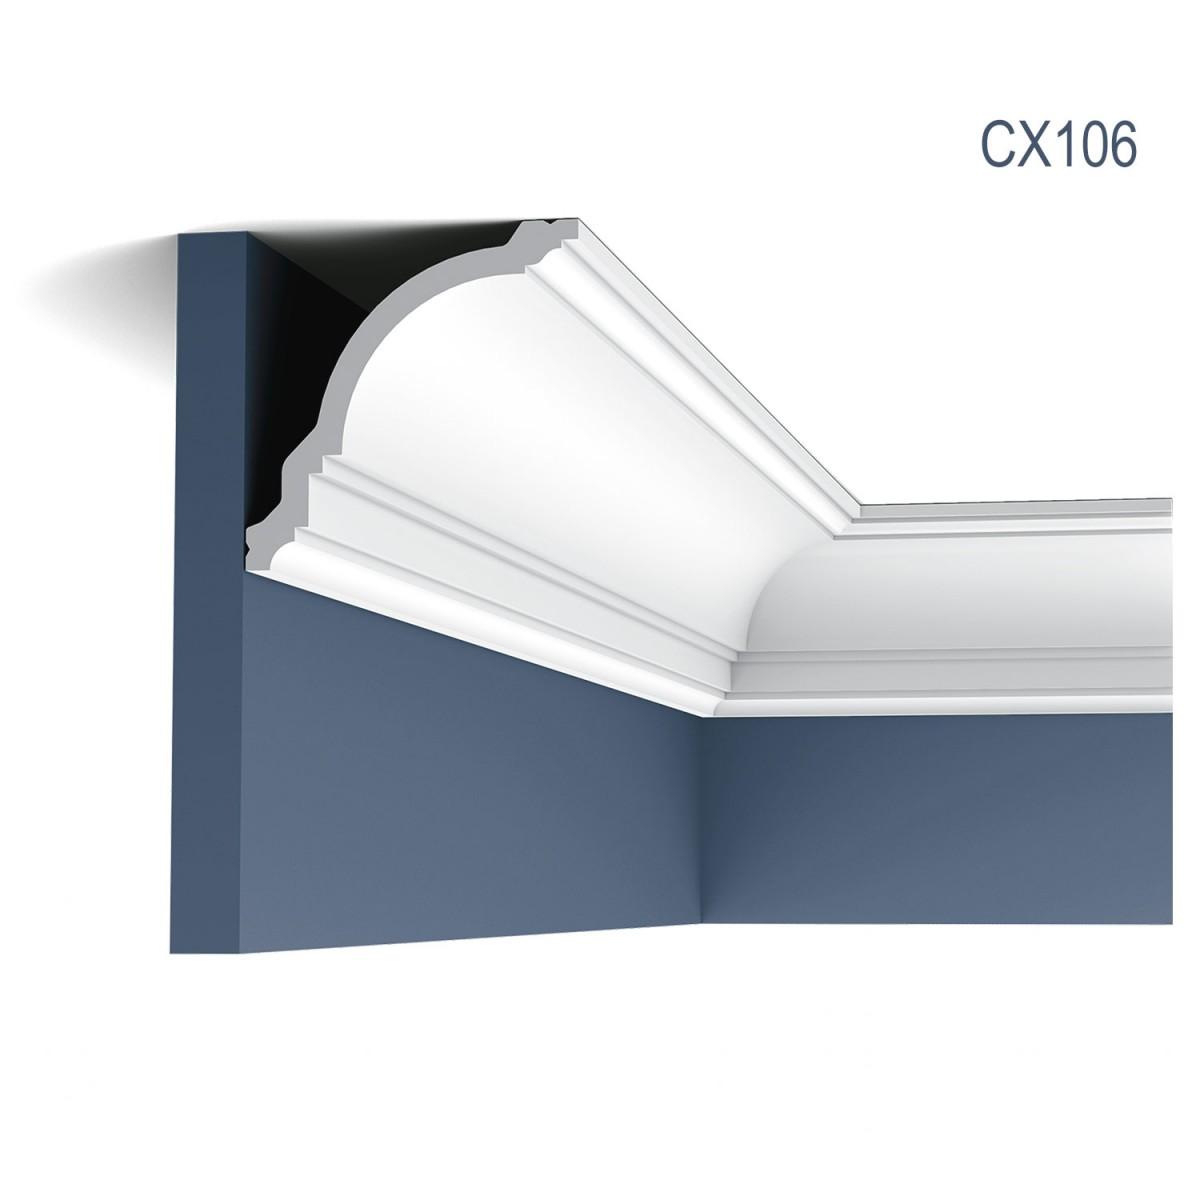 Cornisa Axxent CX106, Dimensiuni: 200 X 11.8 X 11.7 cm, Orac Decor